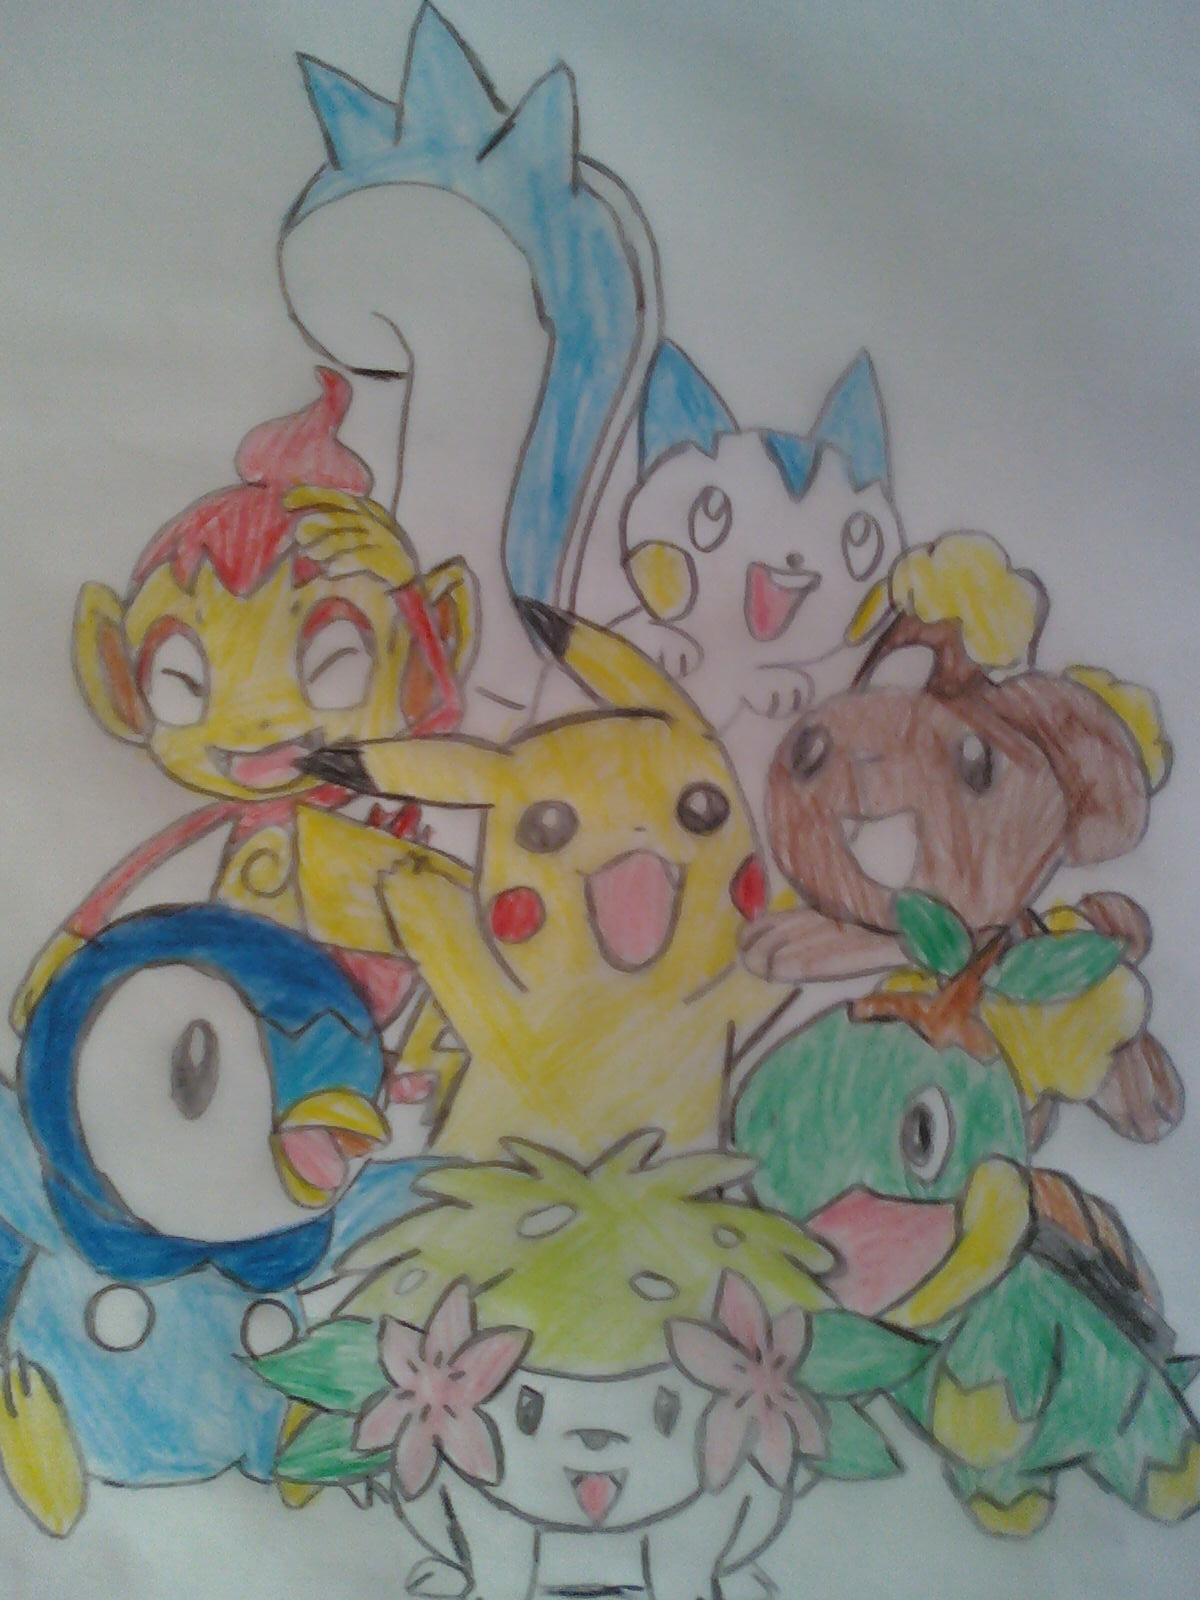 Espace membre galerie de brasegalii - Dessin pokemon couleur ...